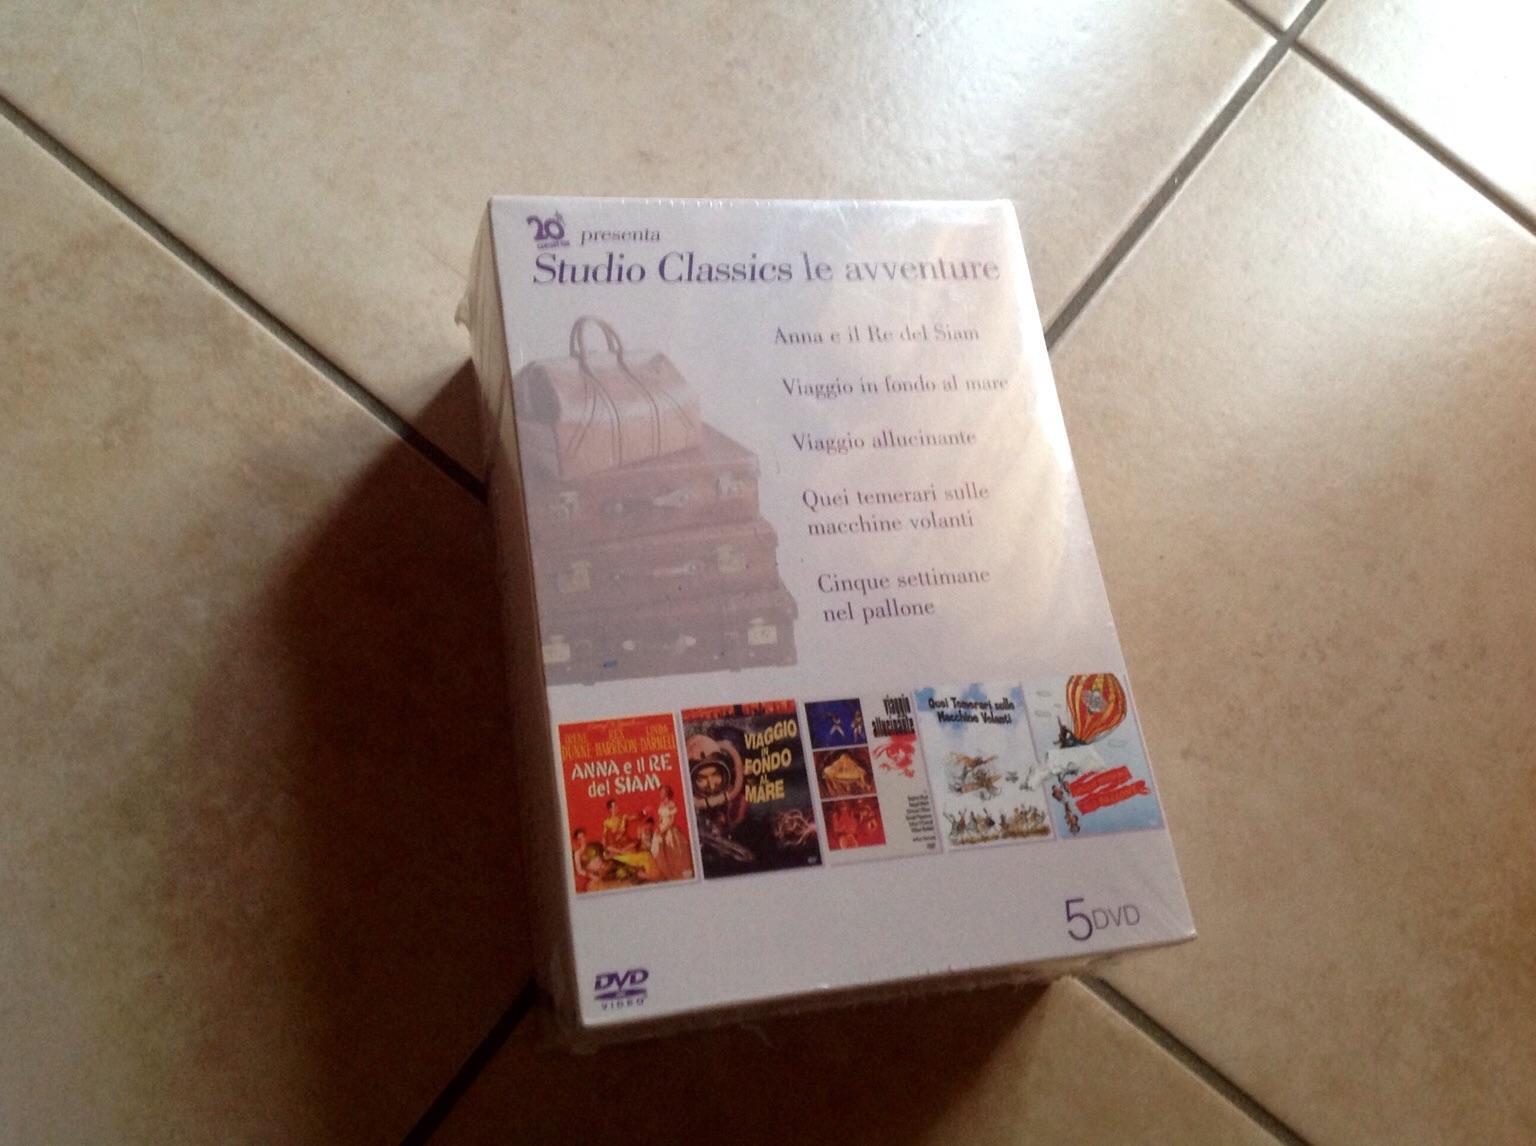 Studio Classics - Le avventure - 5 DVD